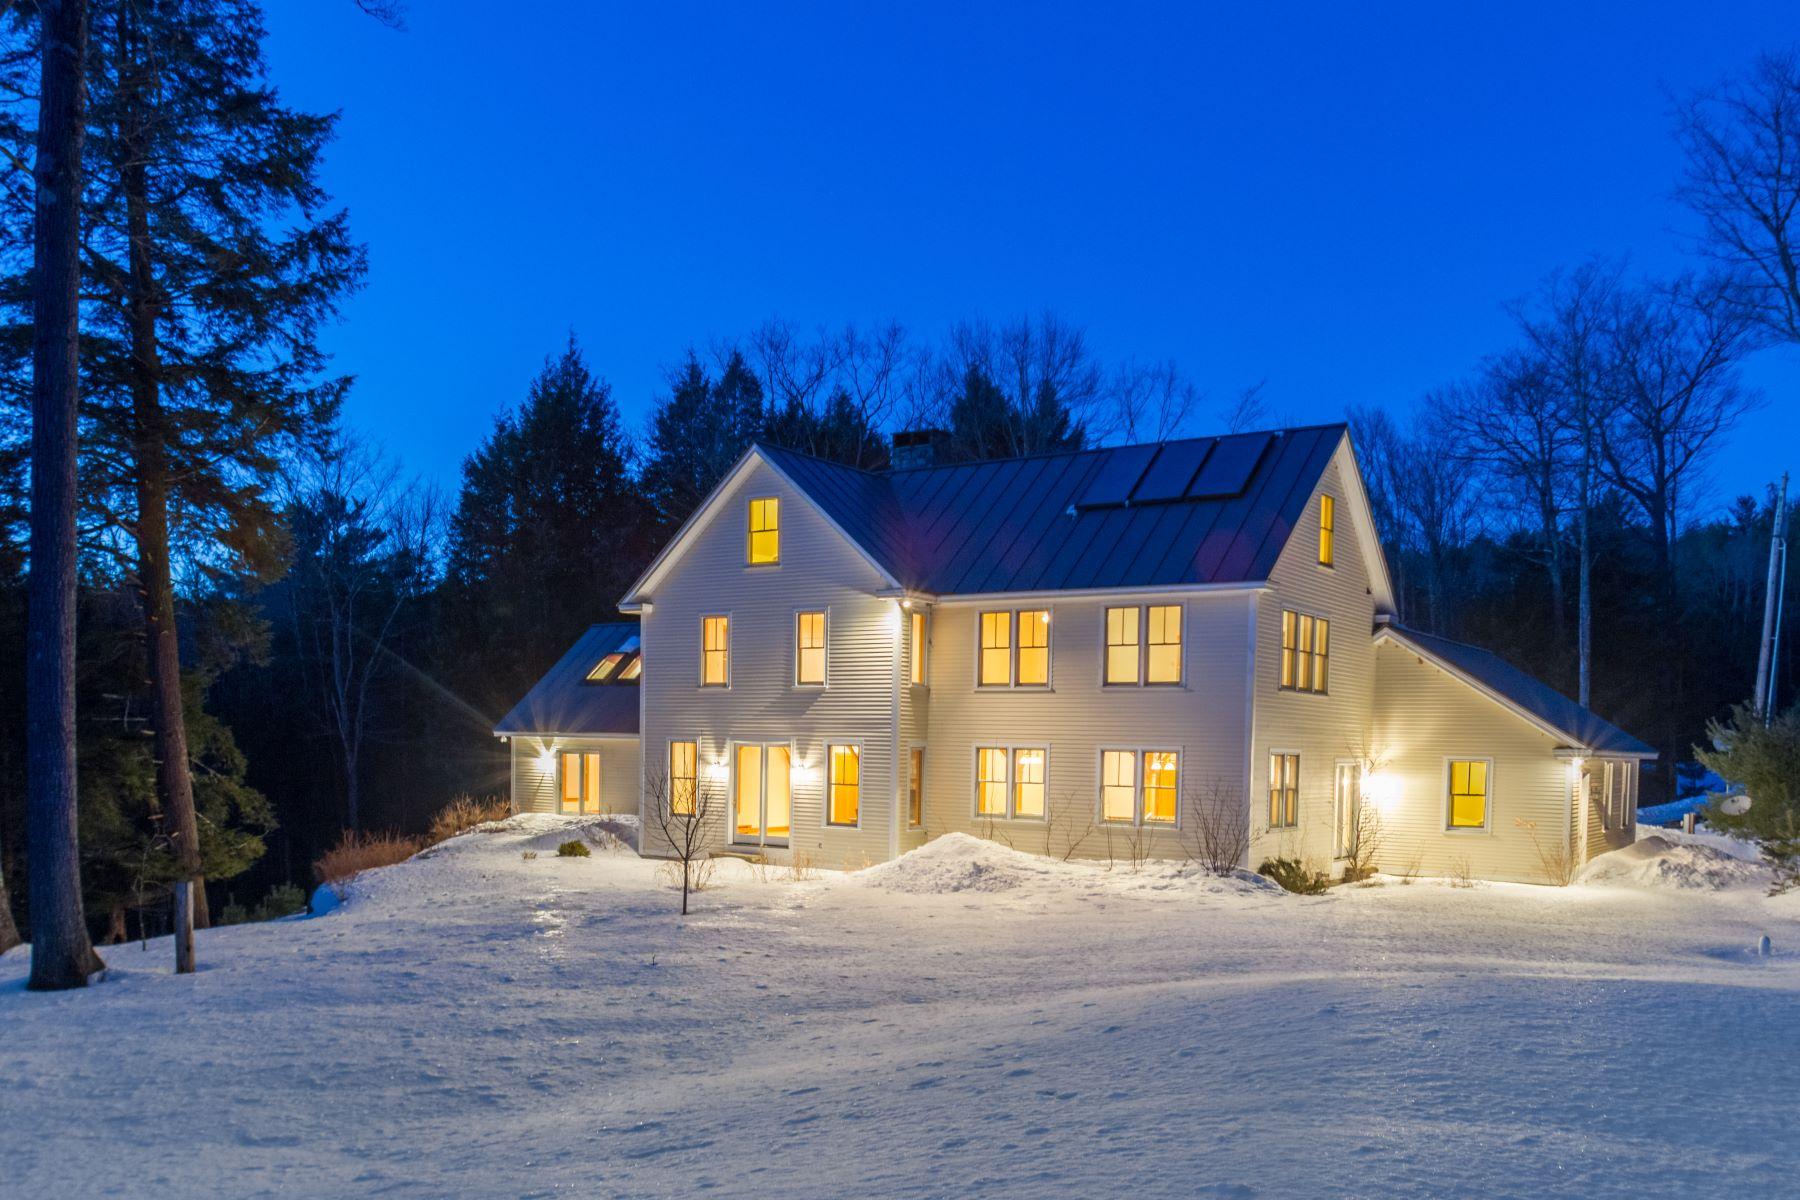 独户住宅 为 销售 在 200 Barbara Lee Lane, Norwich 200 Barbara Lee Ln, 诺维奇, 佛蒙特州, 05055 美国